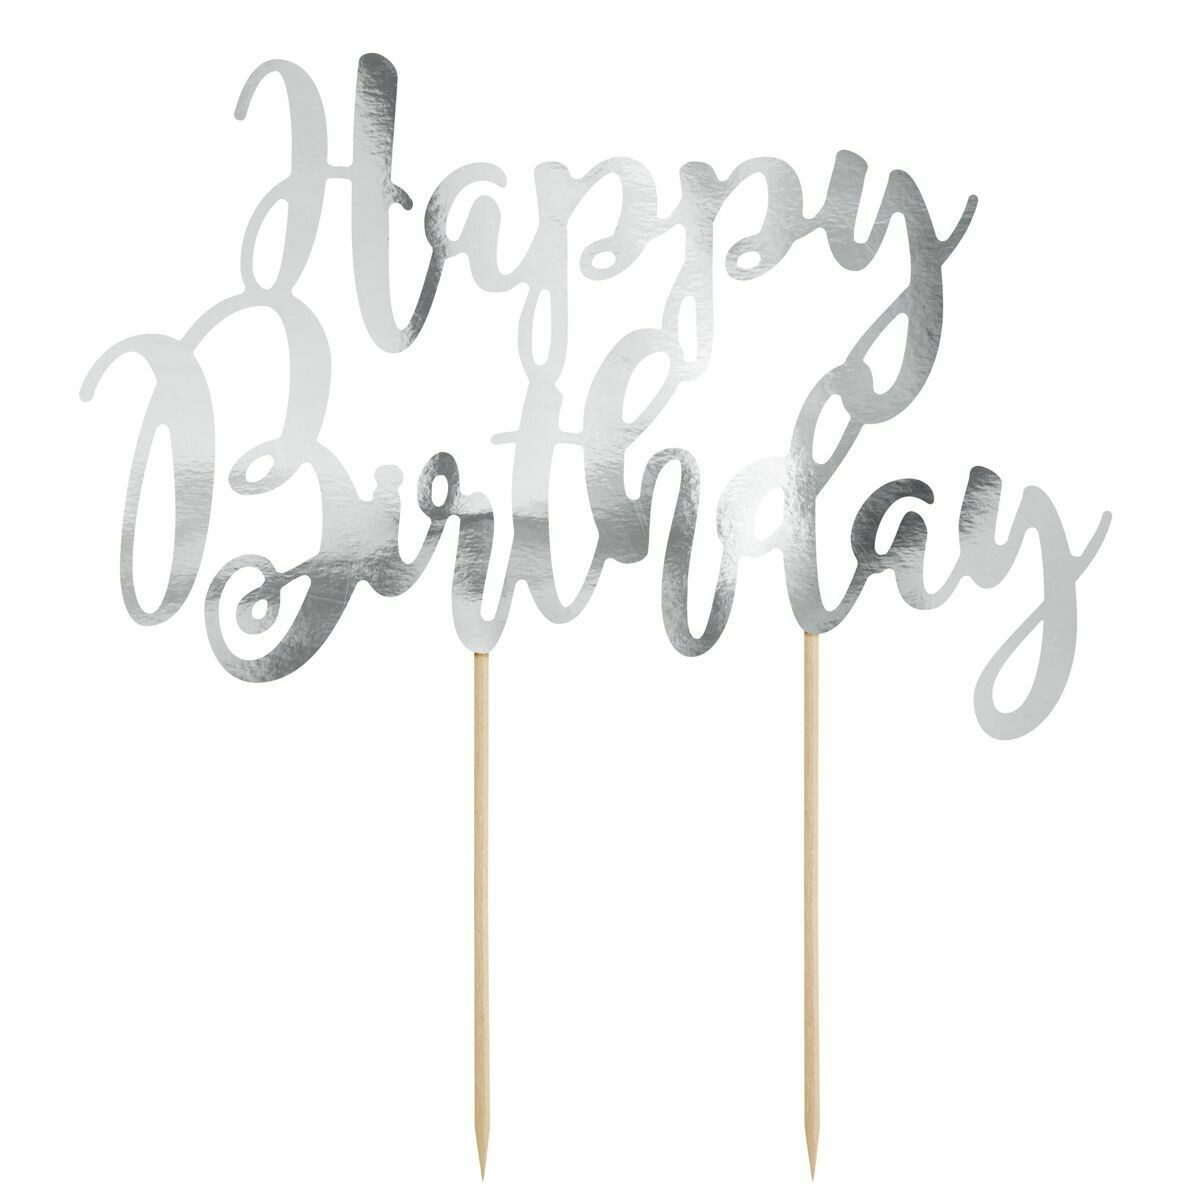 PartyDeco Cake Topper 'Happy Birthday' - SILVER -Τόπερ Τούρτας Ασημί - 'Happy Birthday'